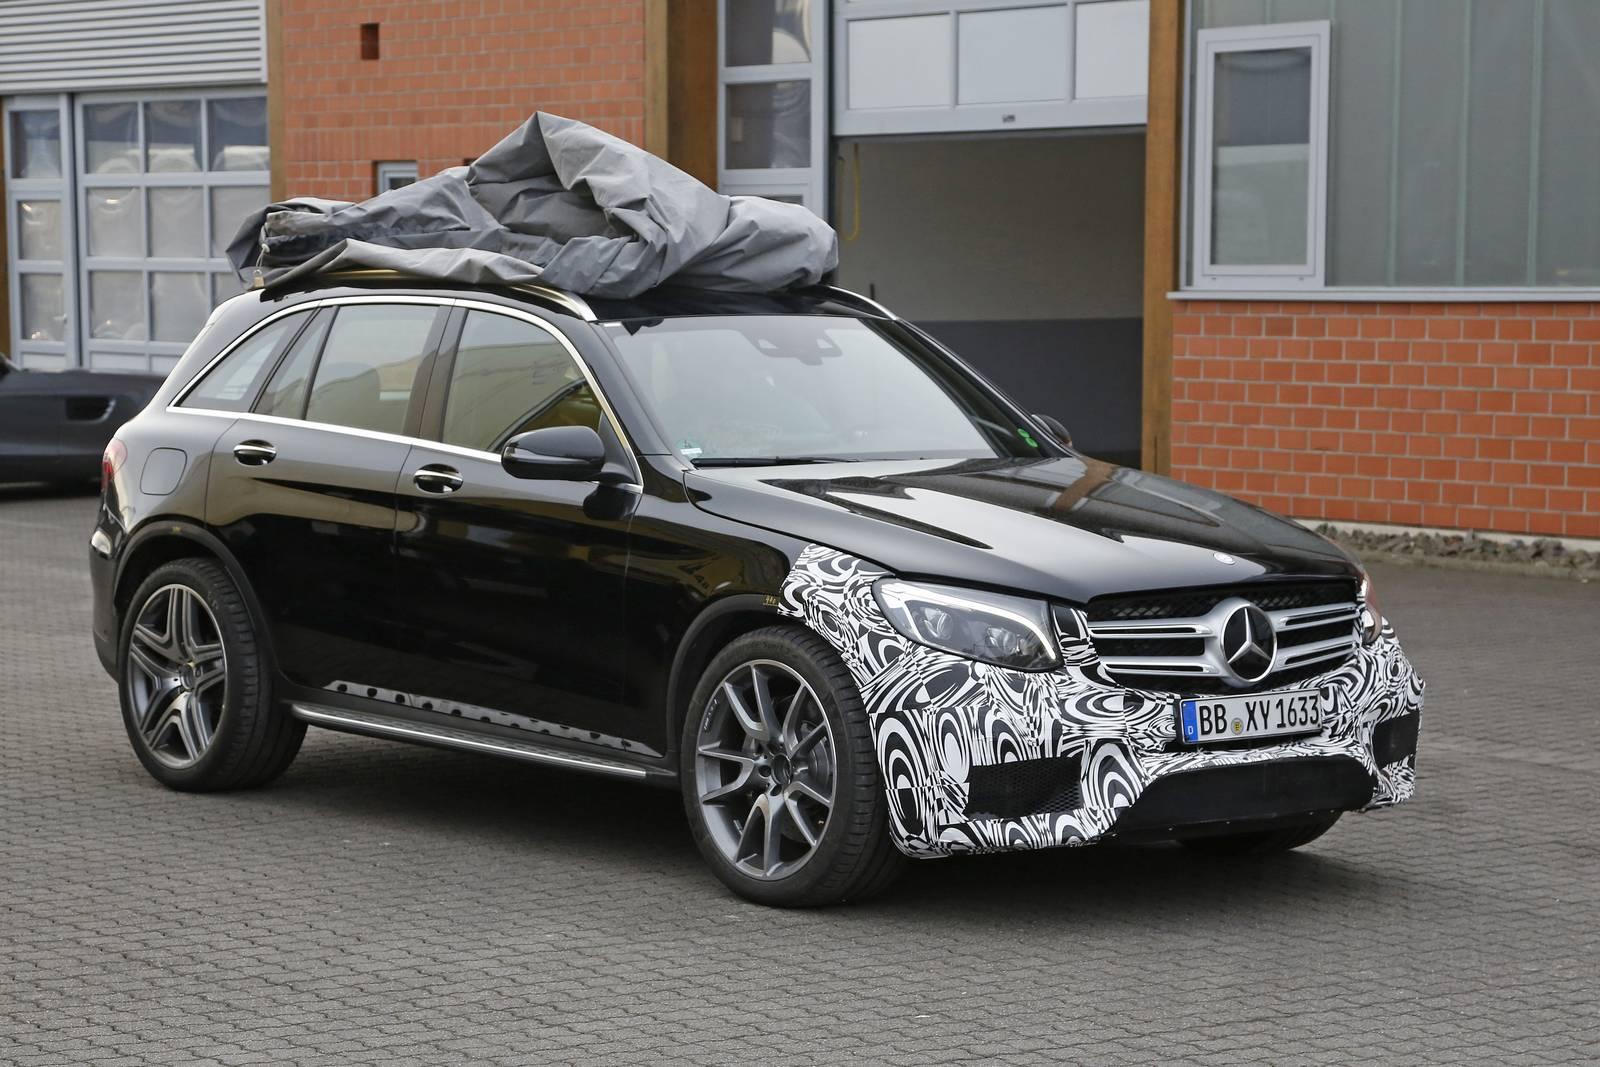 Новый Mercedes-Benz AMG GLC 63 засекли на тестах в Европе 1